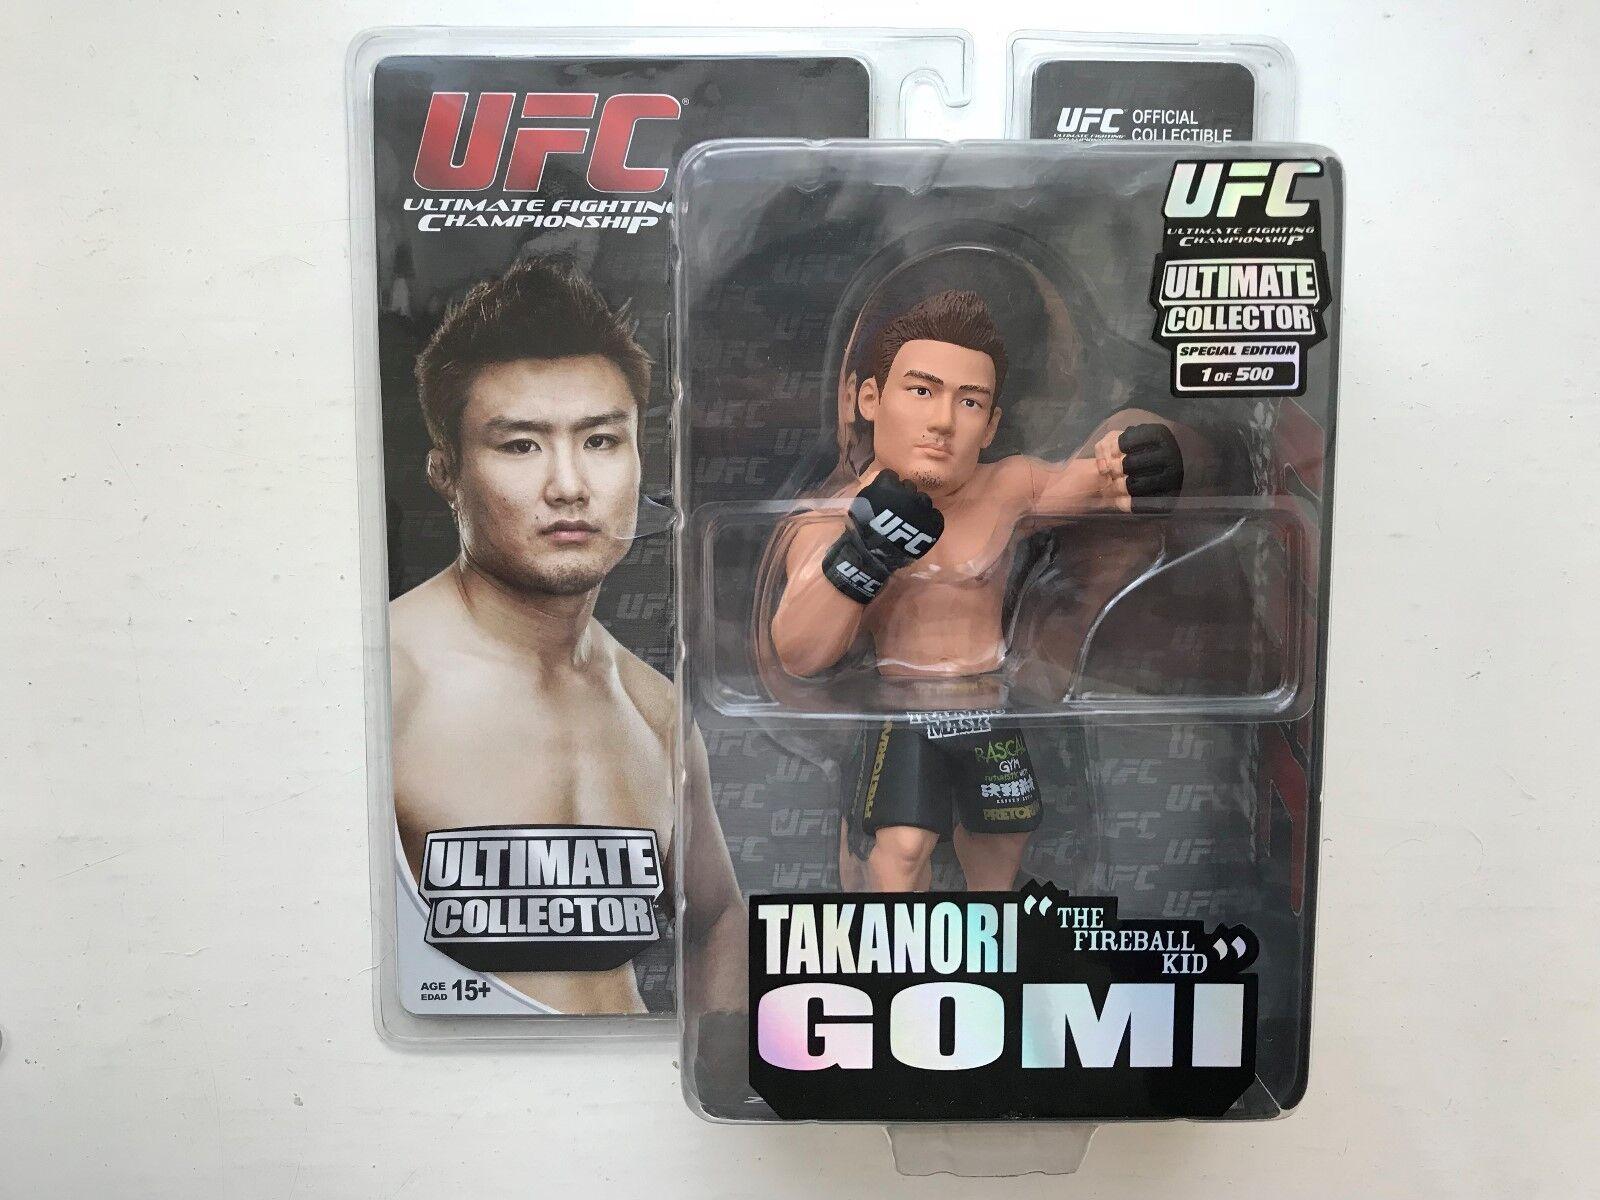 BNIB UFC ROUND 5 TAKANORI GOMI ULTIMATE COLLECTOR SERIES FIGURE LIMITED EDITION